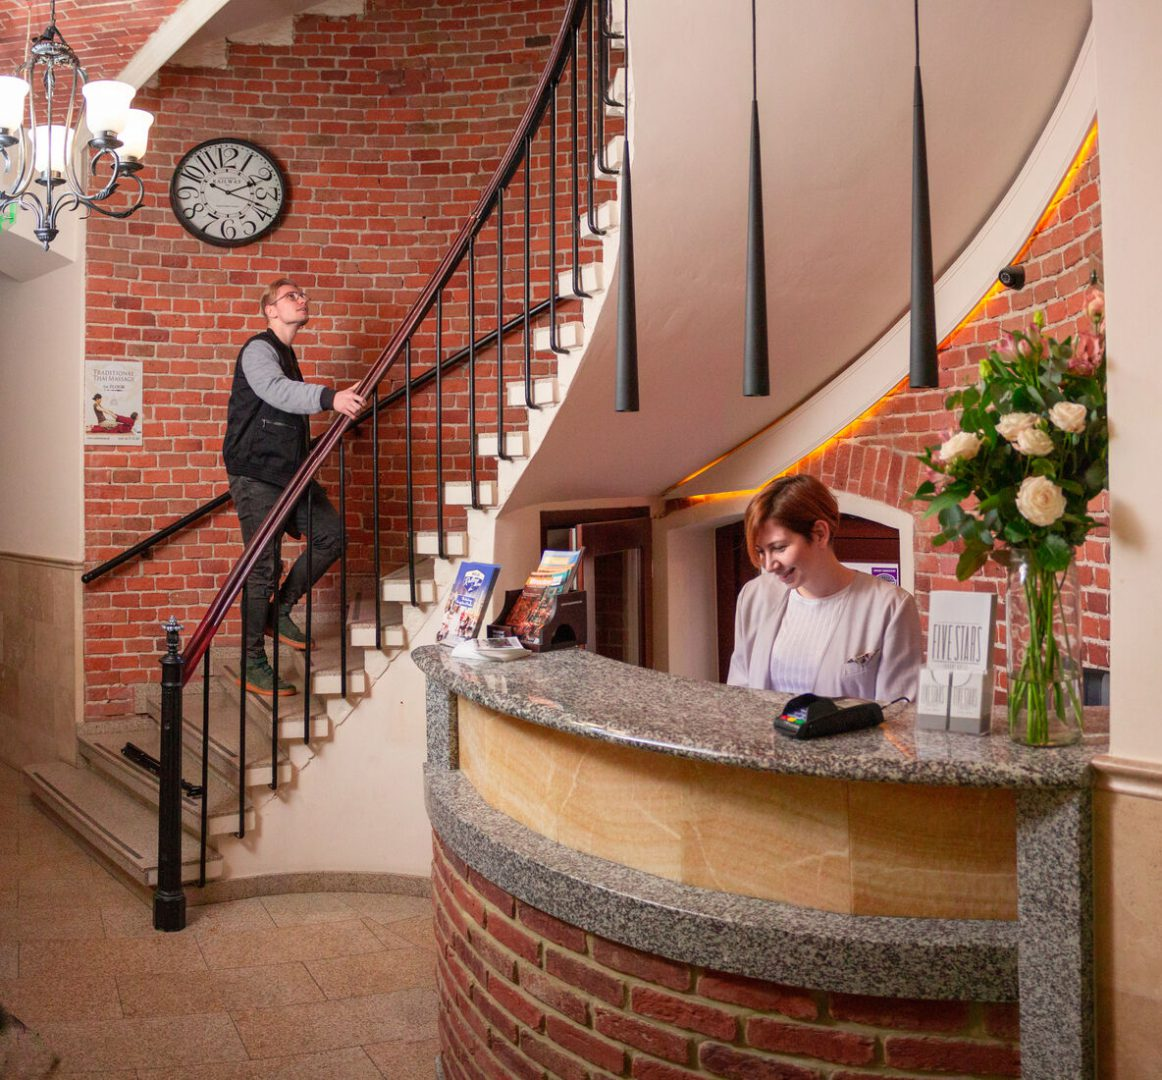 Five Stars Bed & Breakfast Hostel Wrocław recepcja i kontakt